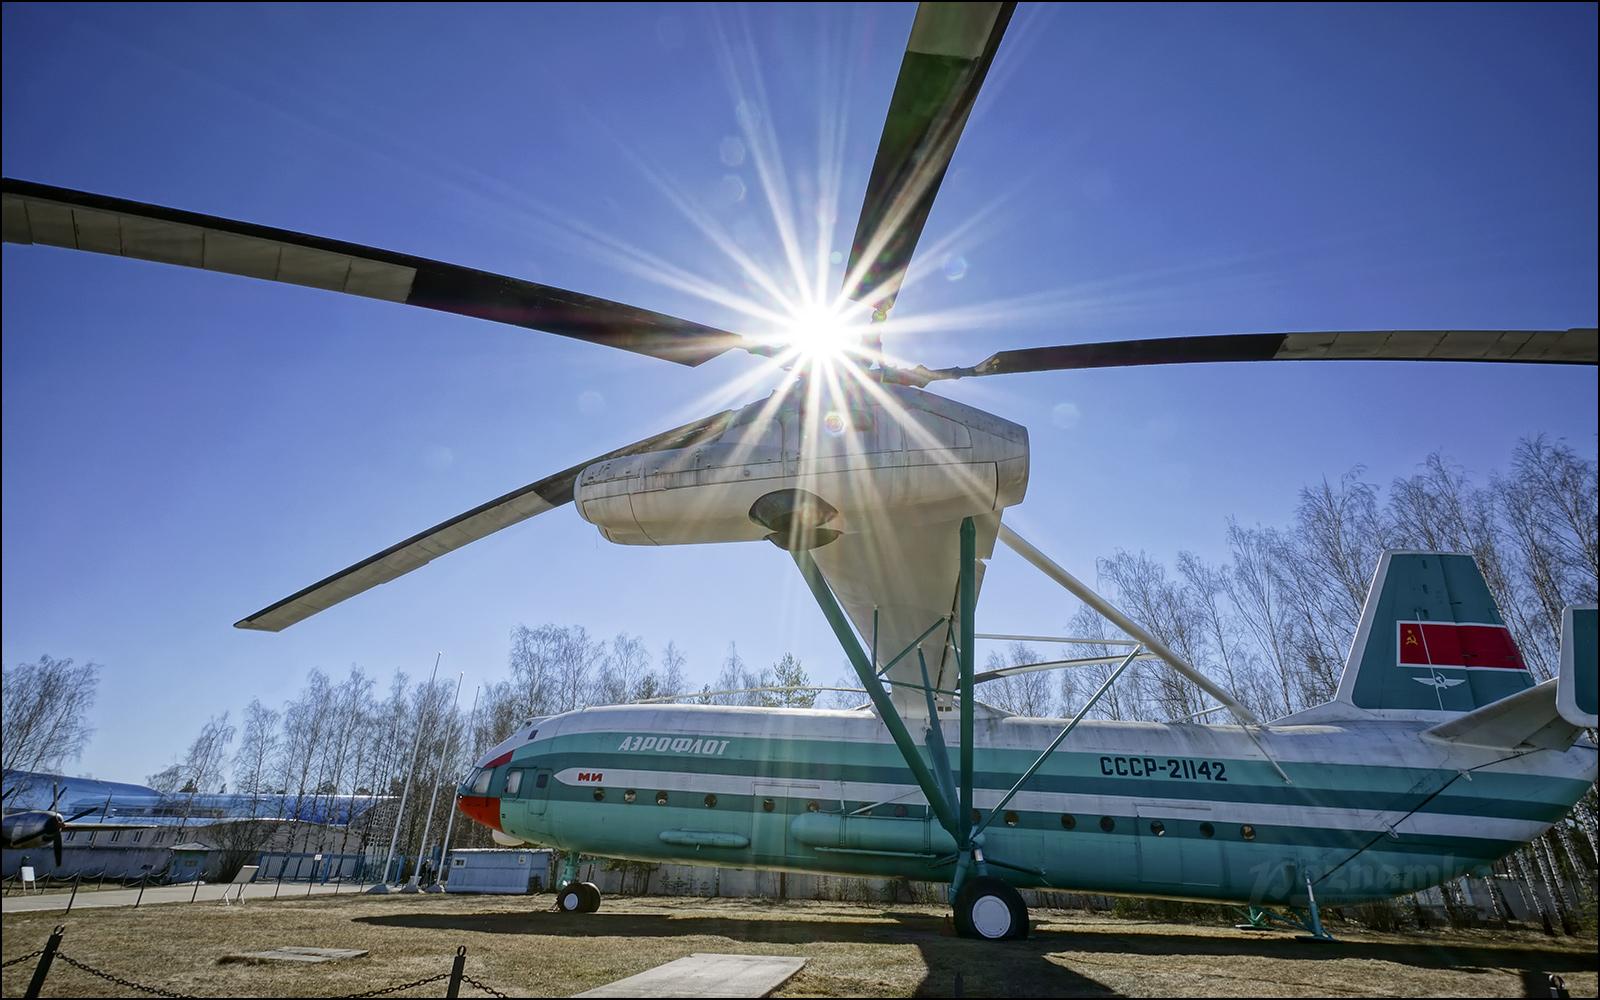 Музей авиации в Монино вместе с Poznamka.